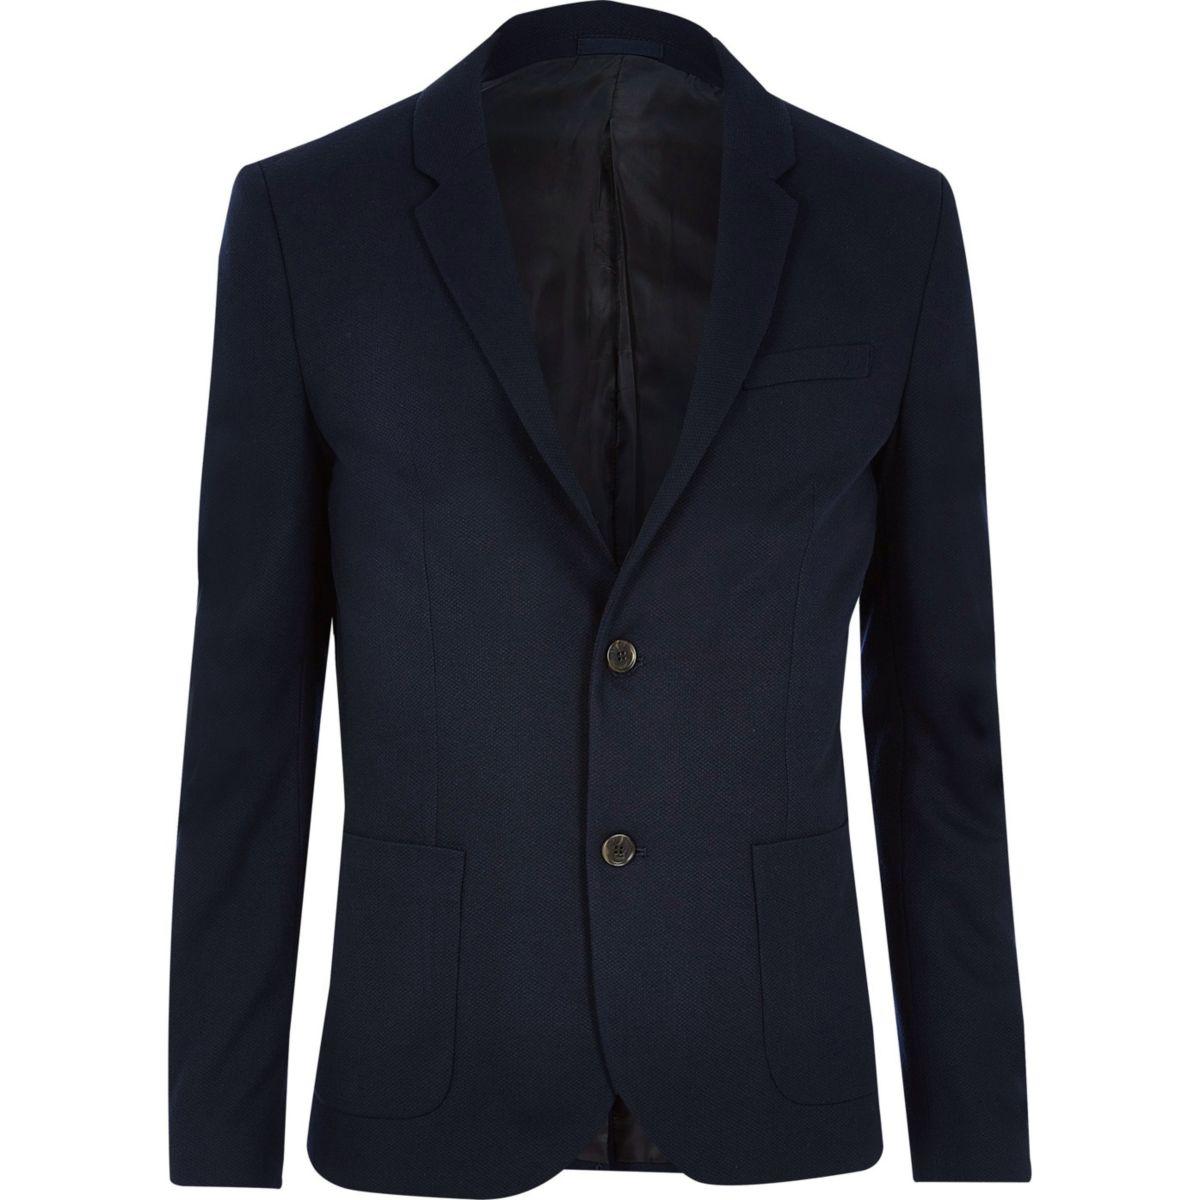 Big and Tall navy blazer